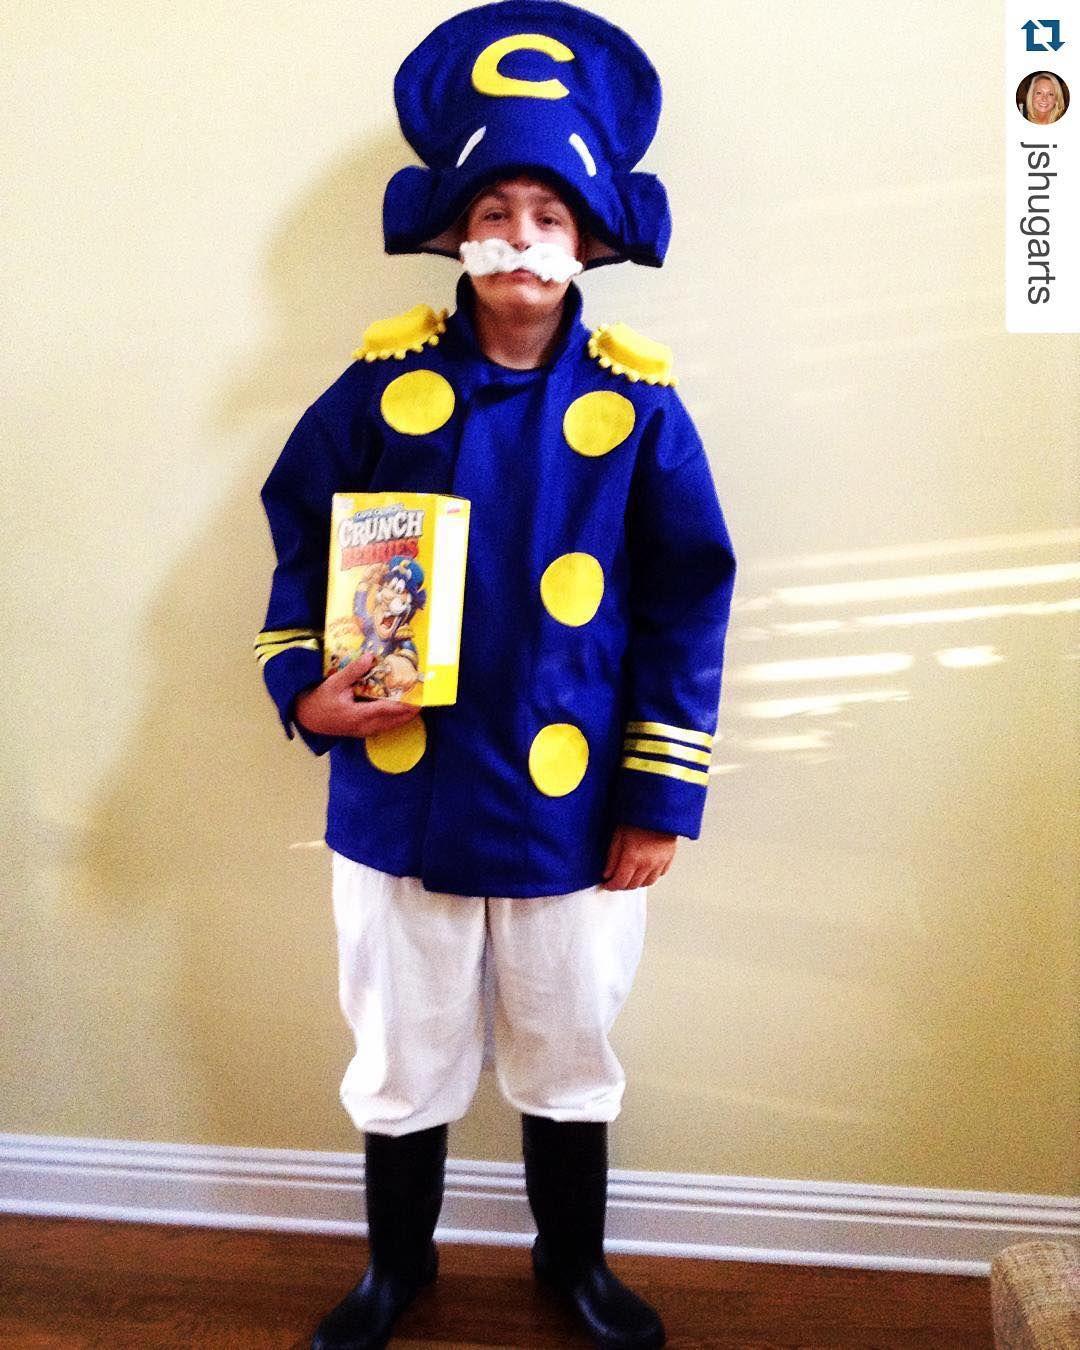 @jshugarts #Homecoming #CullmanHighSchool  Individual Costume Winner!! #capncrunch #homecoming2015